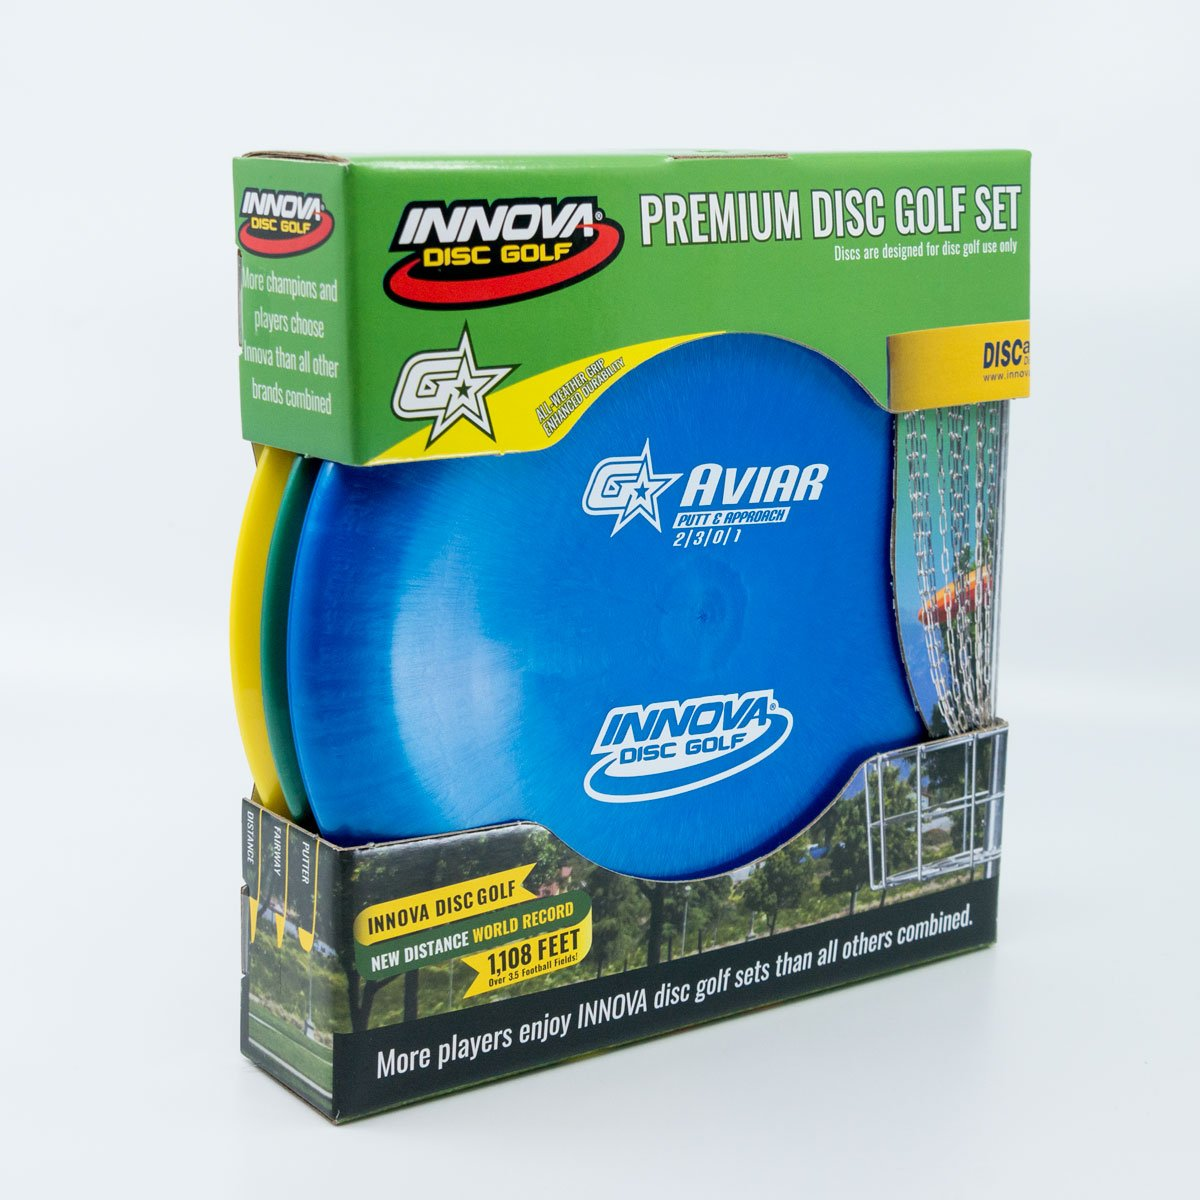 Innova Discs GStar Premium 3-Disc Beginner Disc Golf Set